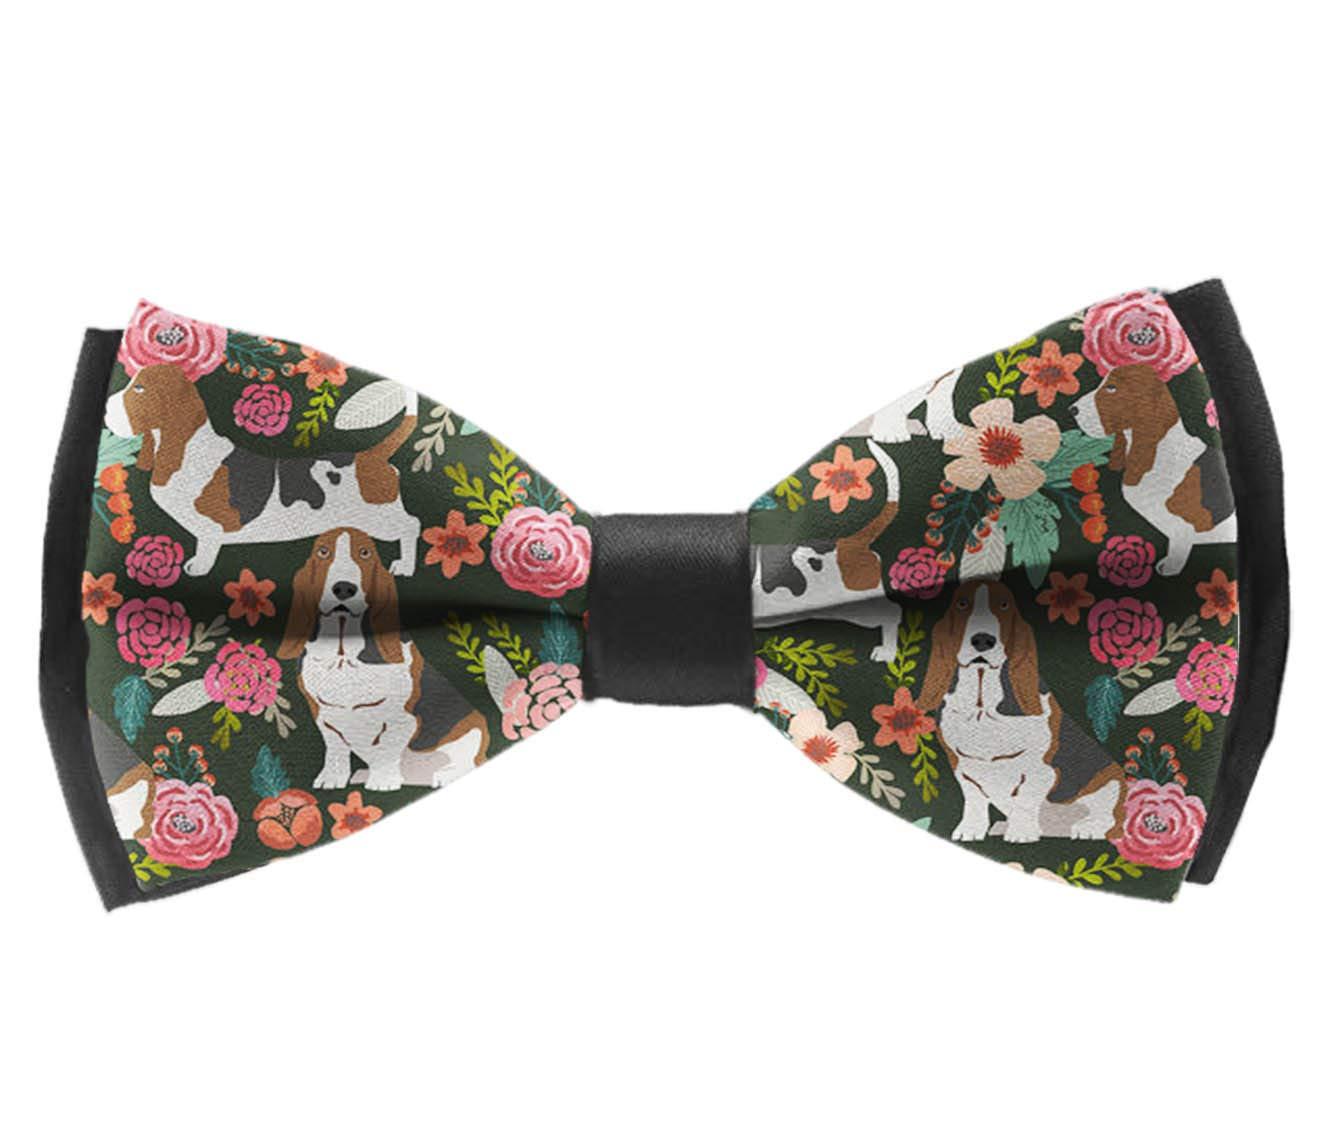 Basset Hound Dog Adjustable Bowtie INWANZI Fashion Elegant Pre-Tied Bow Tie for Men /& Boys